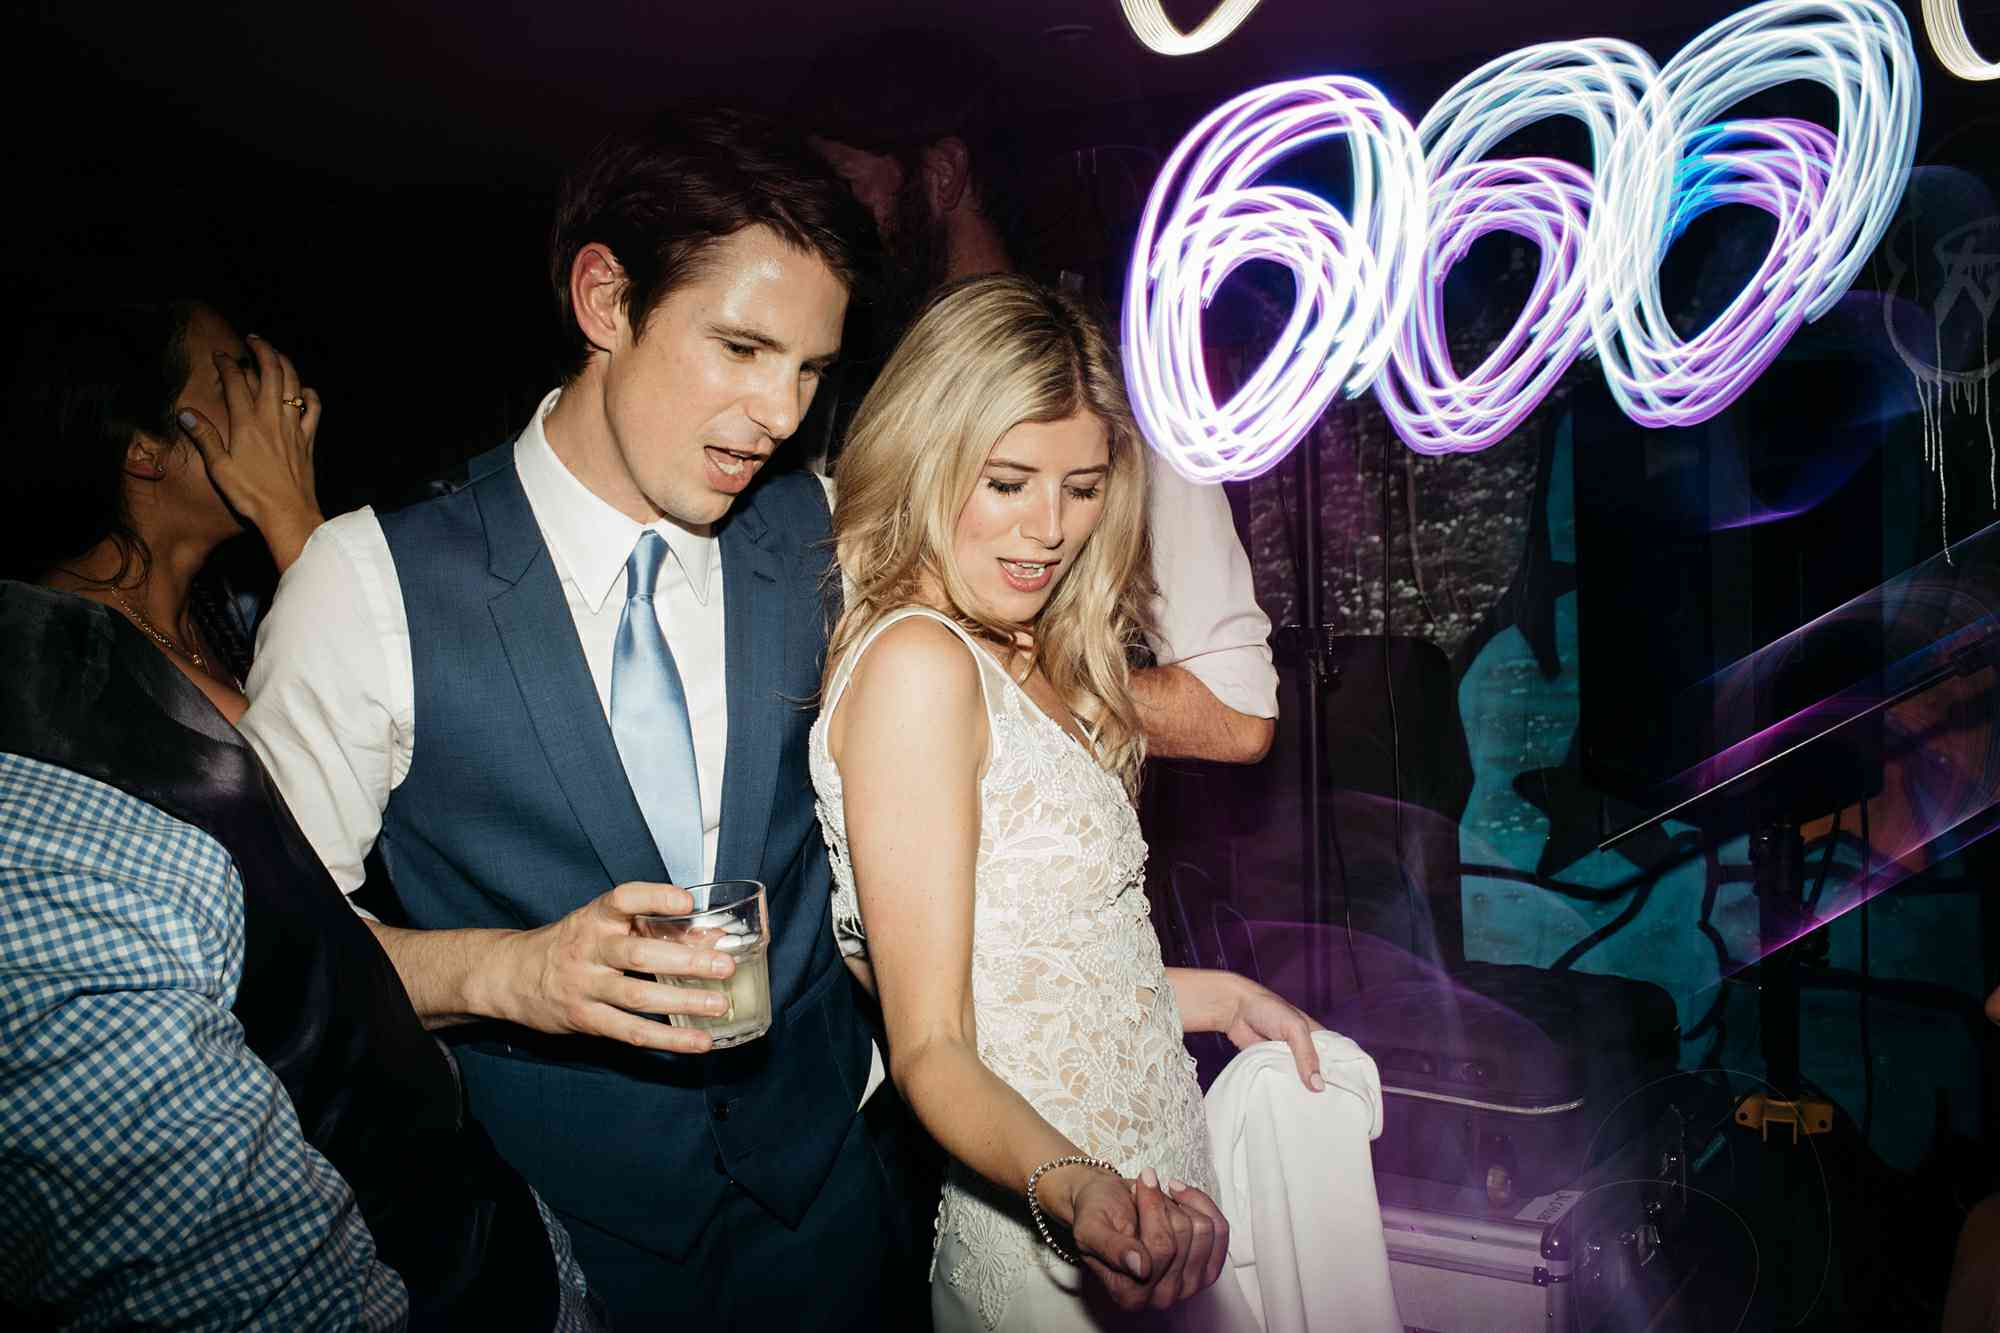 Bride and groom dancing during wedding